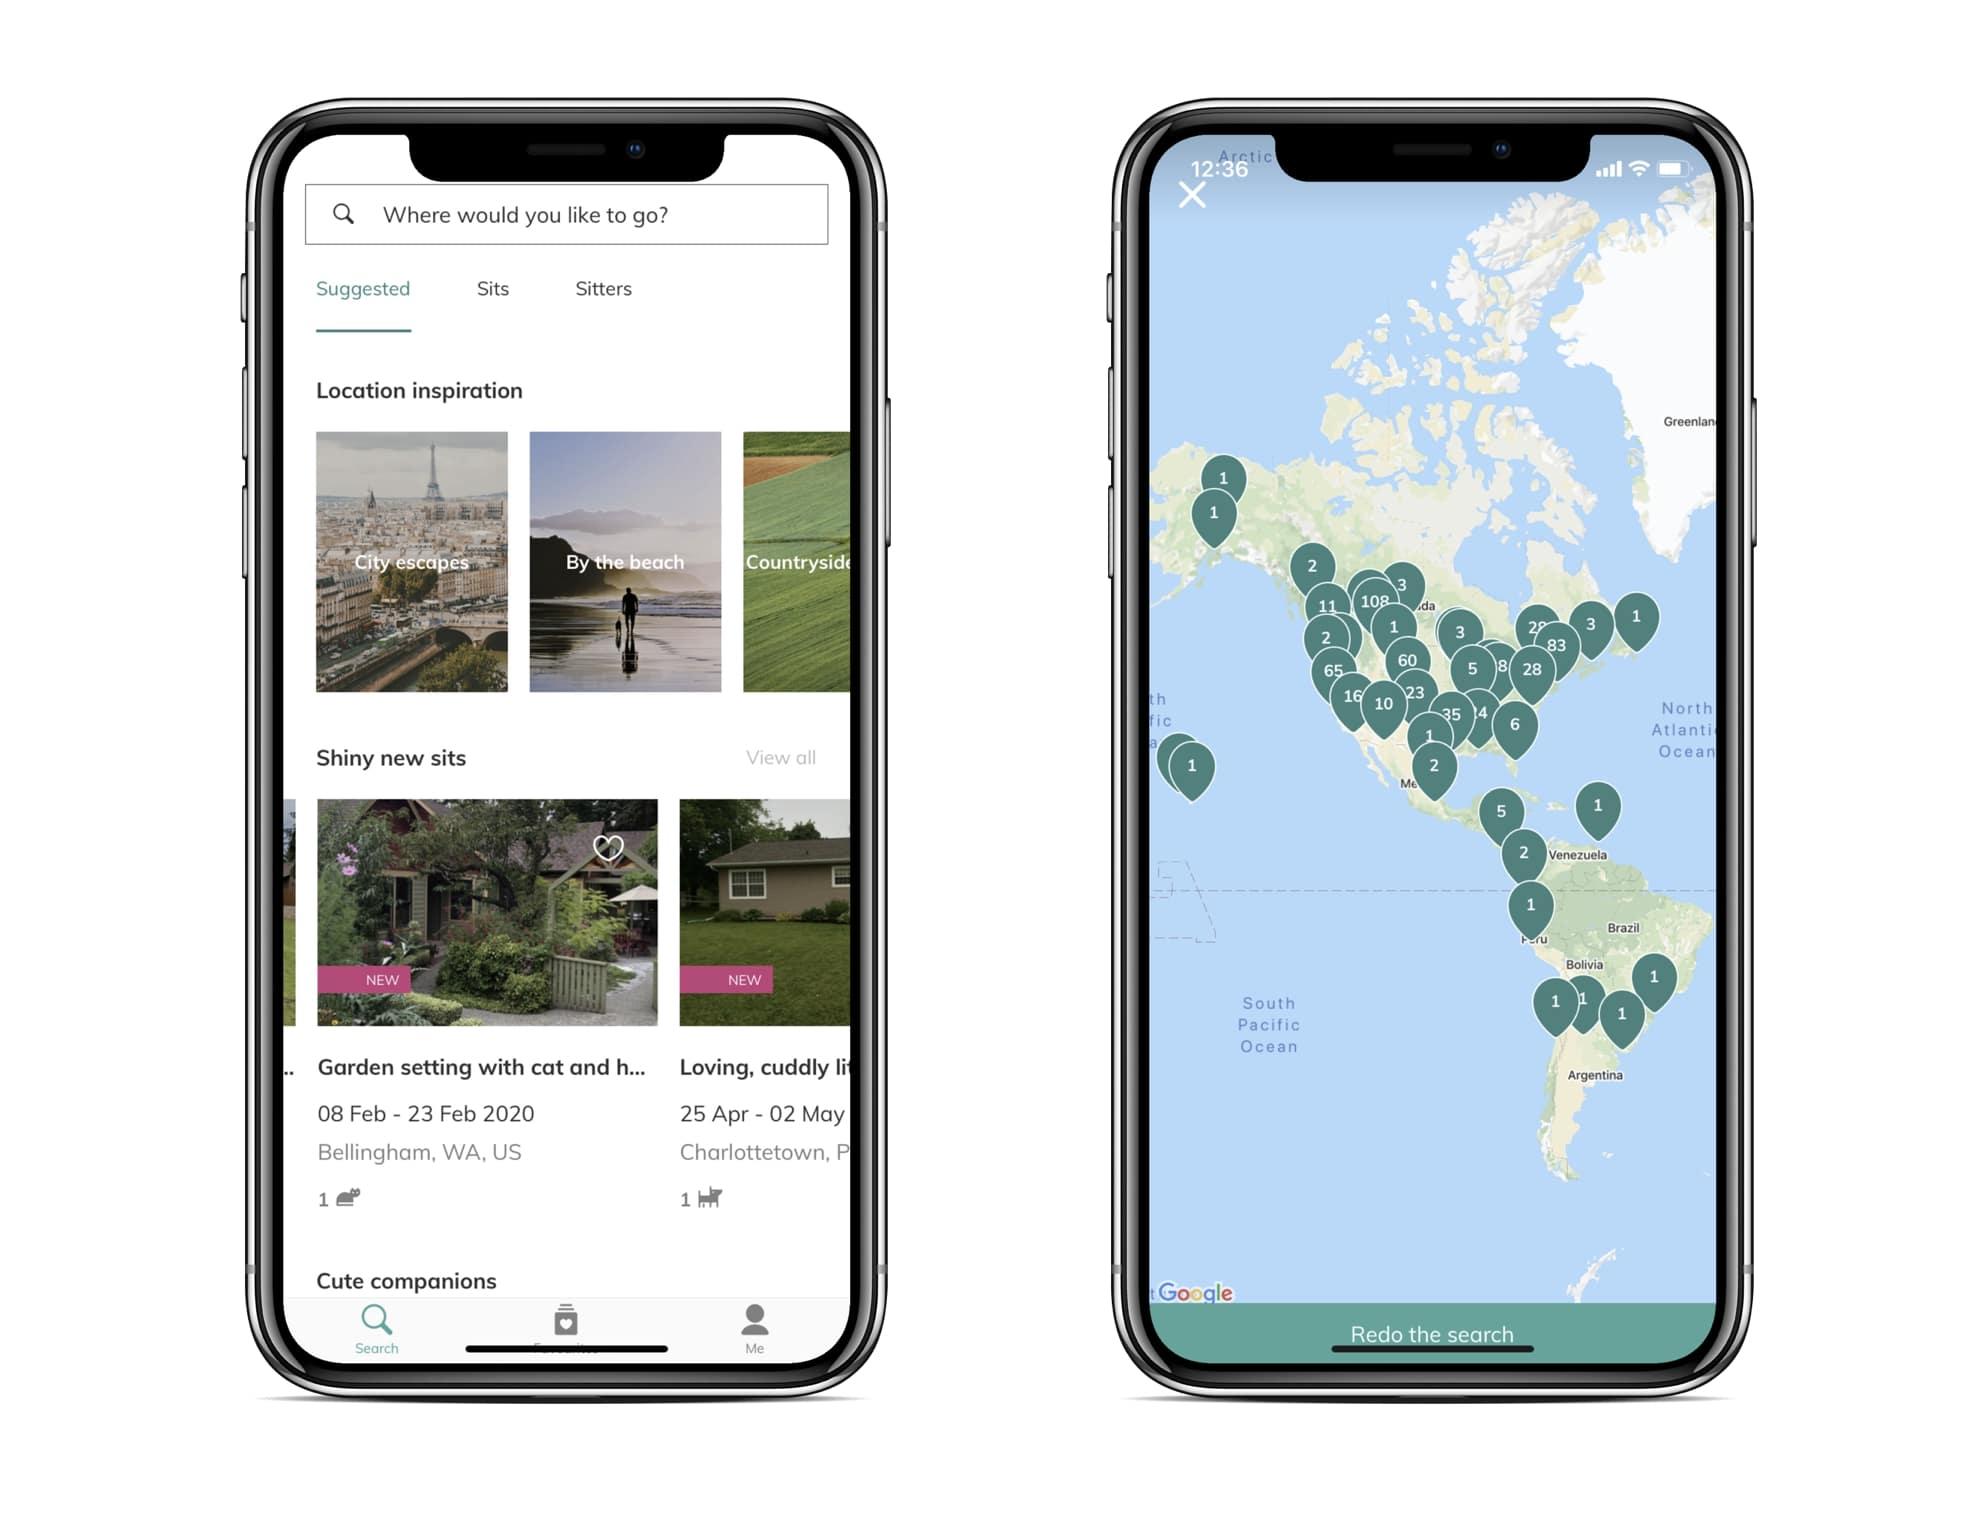 screenshots of Trustedhousesitters app